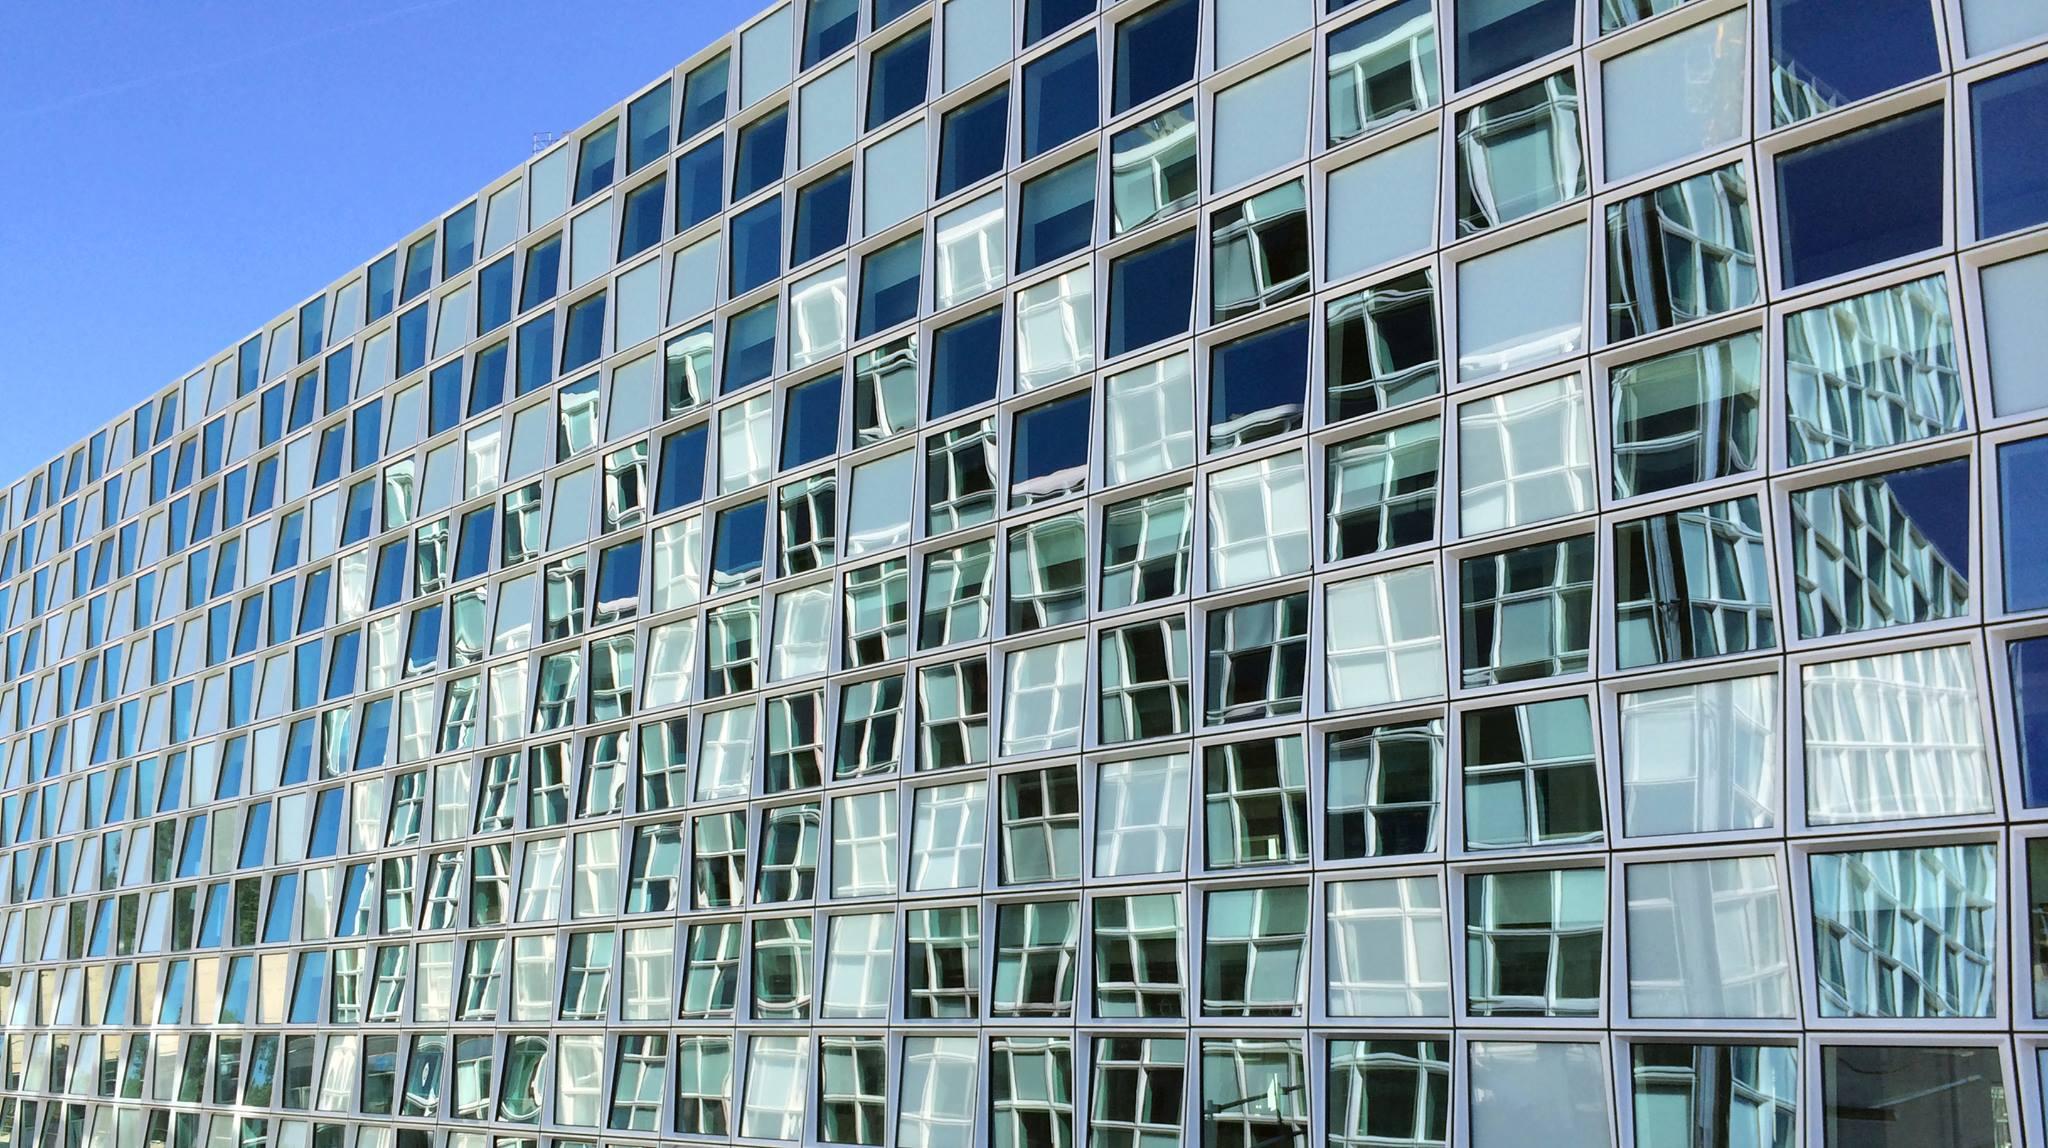 Internationaal Strafhof nadert oplevering - architectenweb.nl